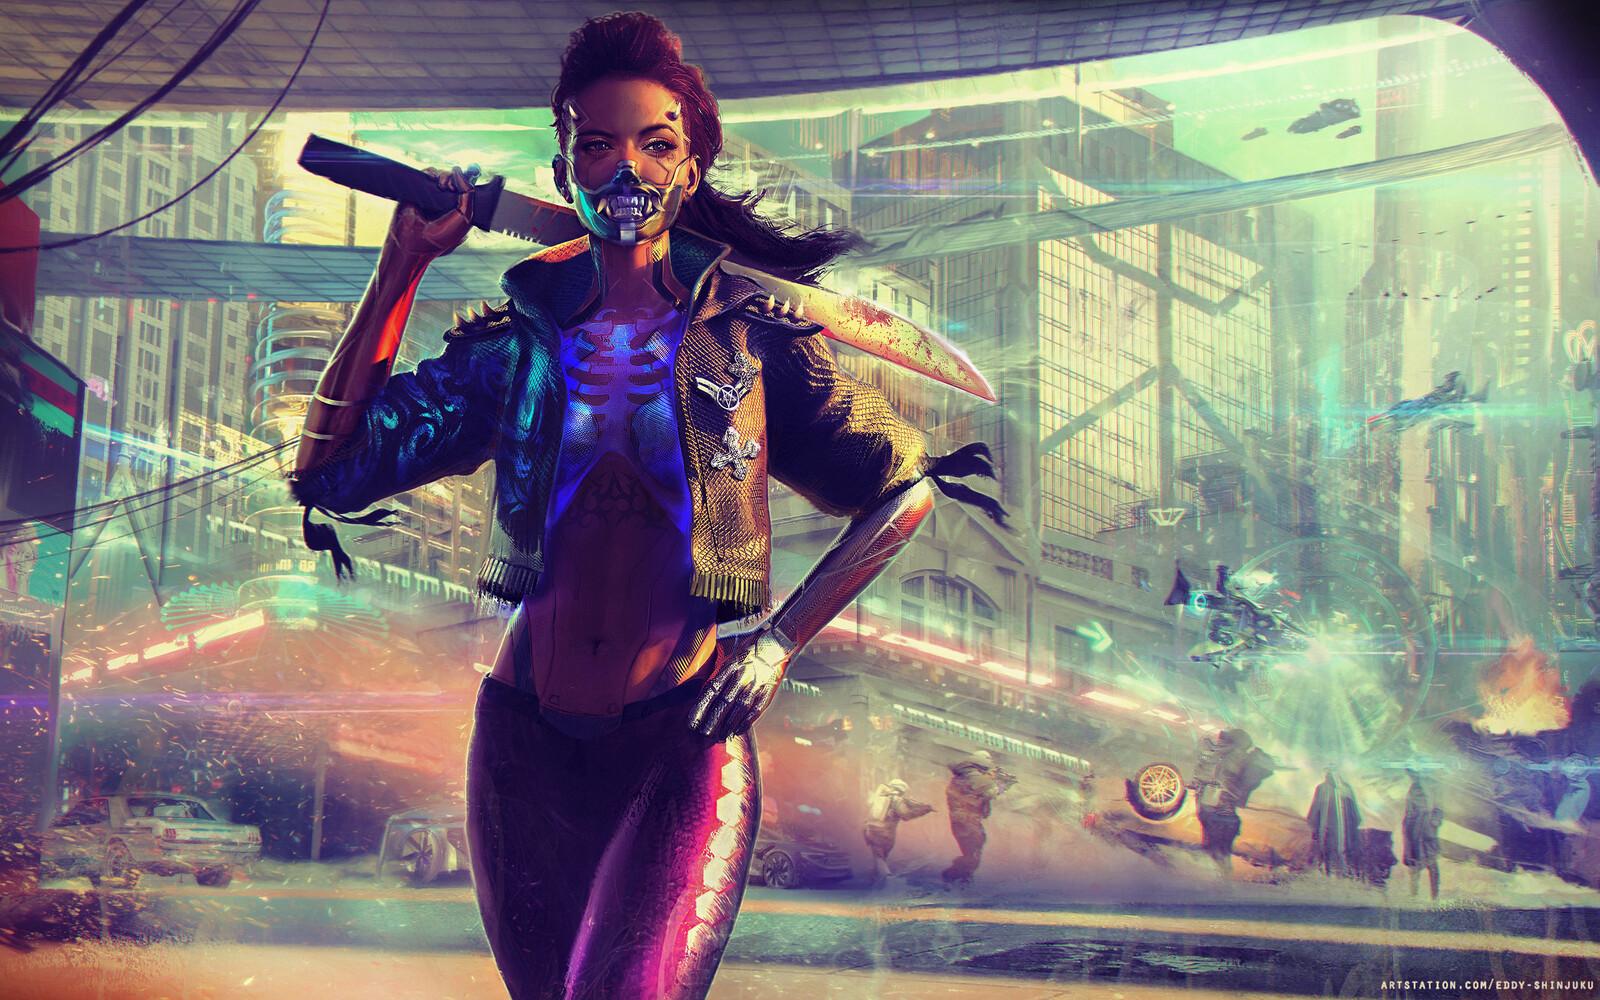 Cyberpunk Tabletop Art